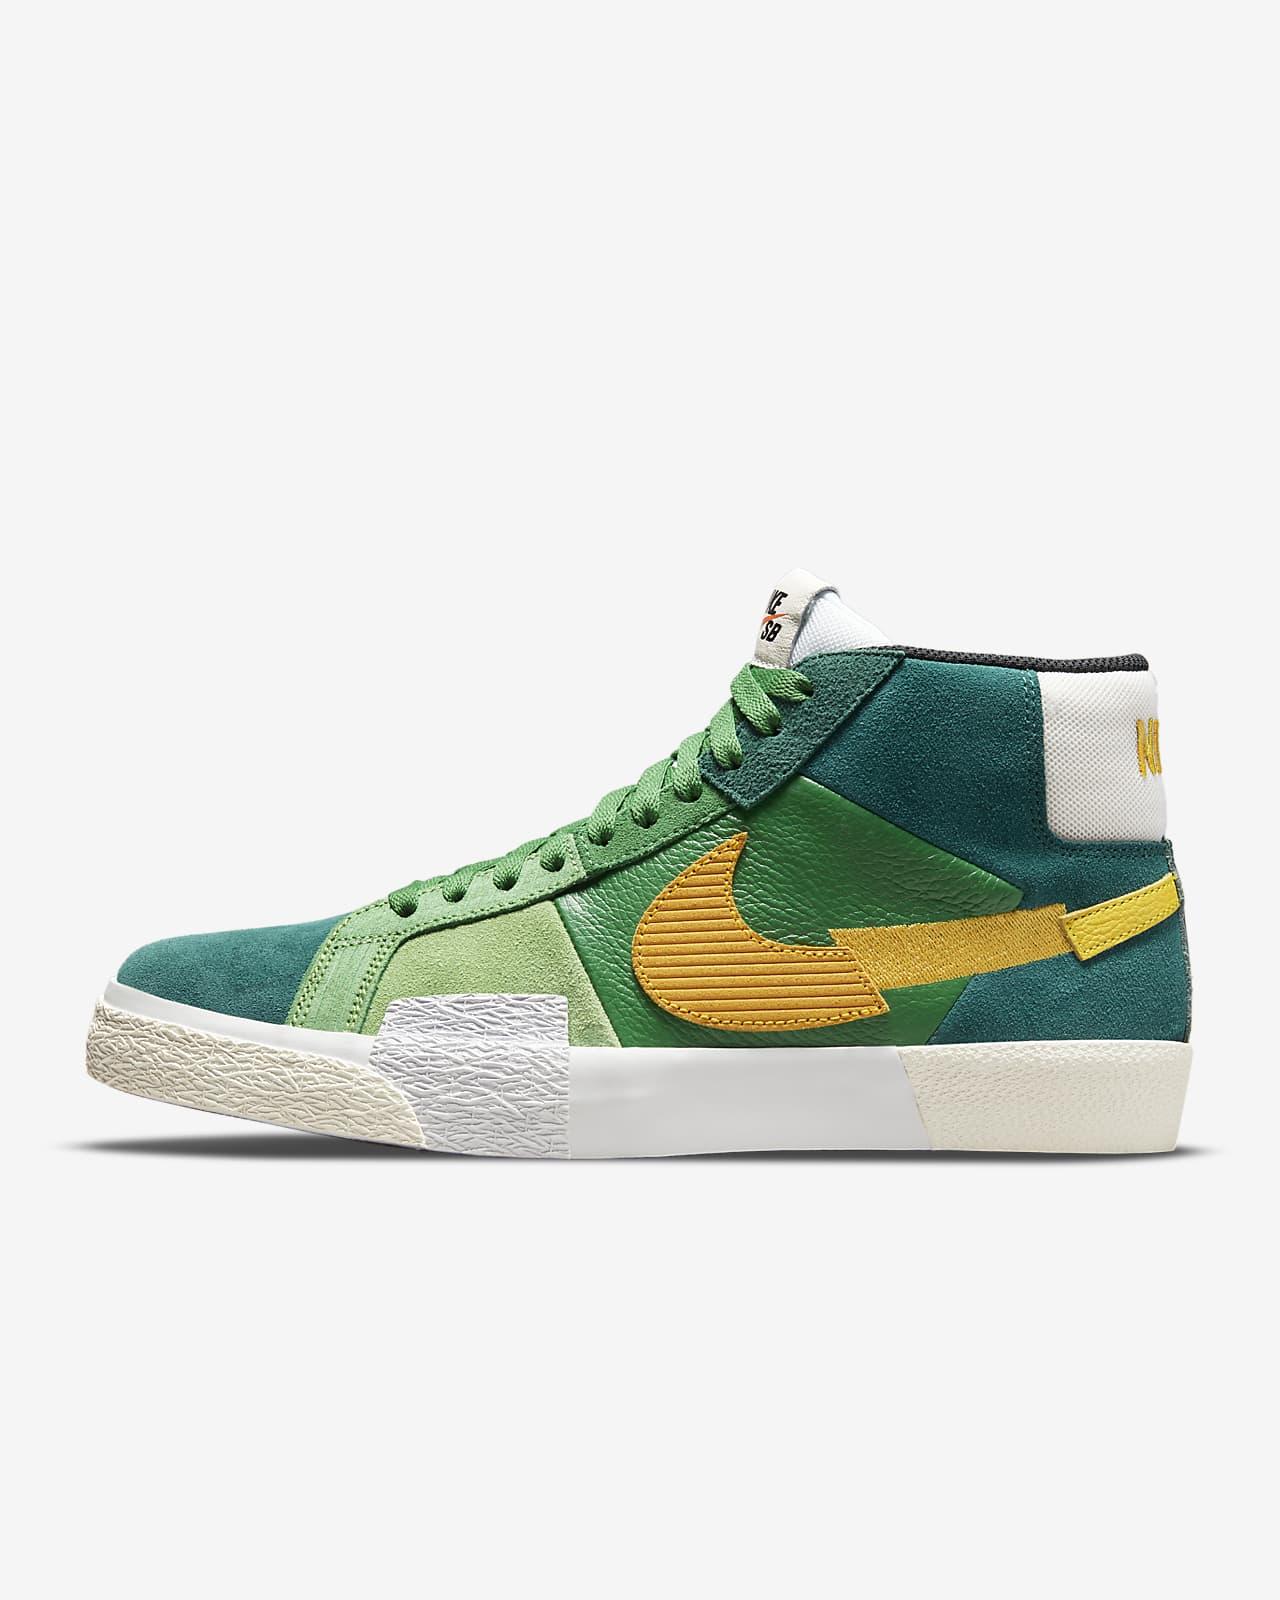 Chaussure de skateboard Nike SB Zoom Blazer Mid Premium. Nike LU